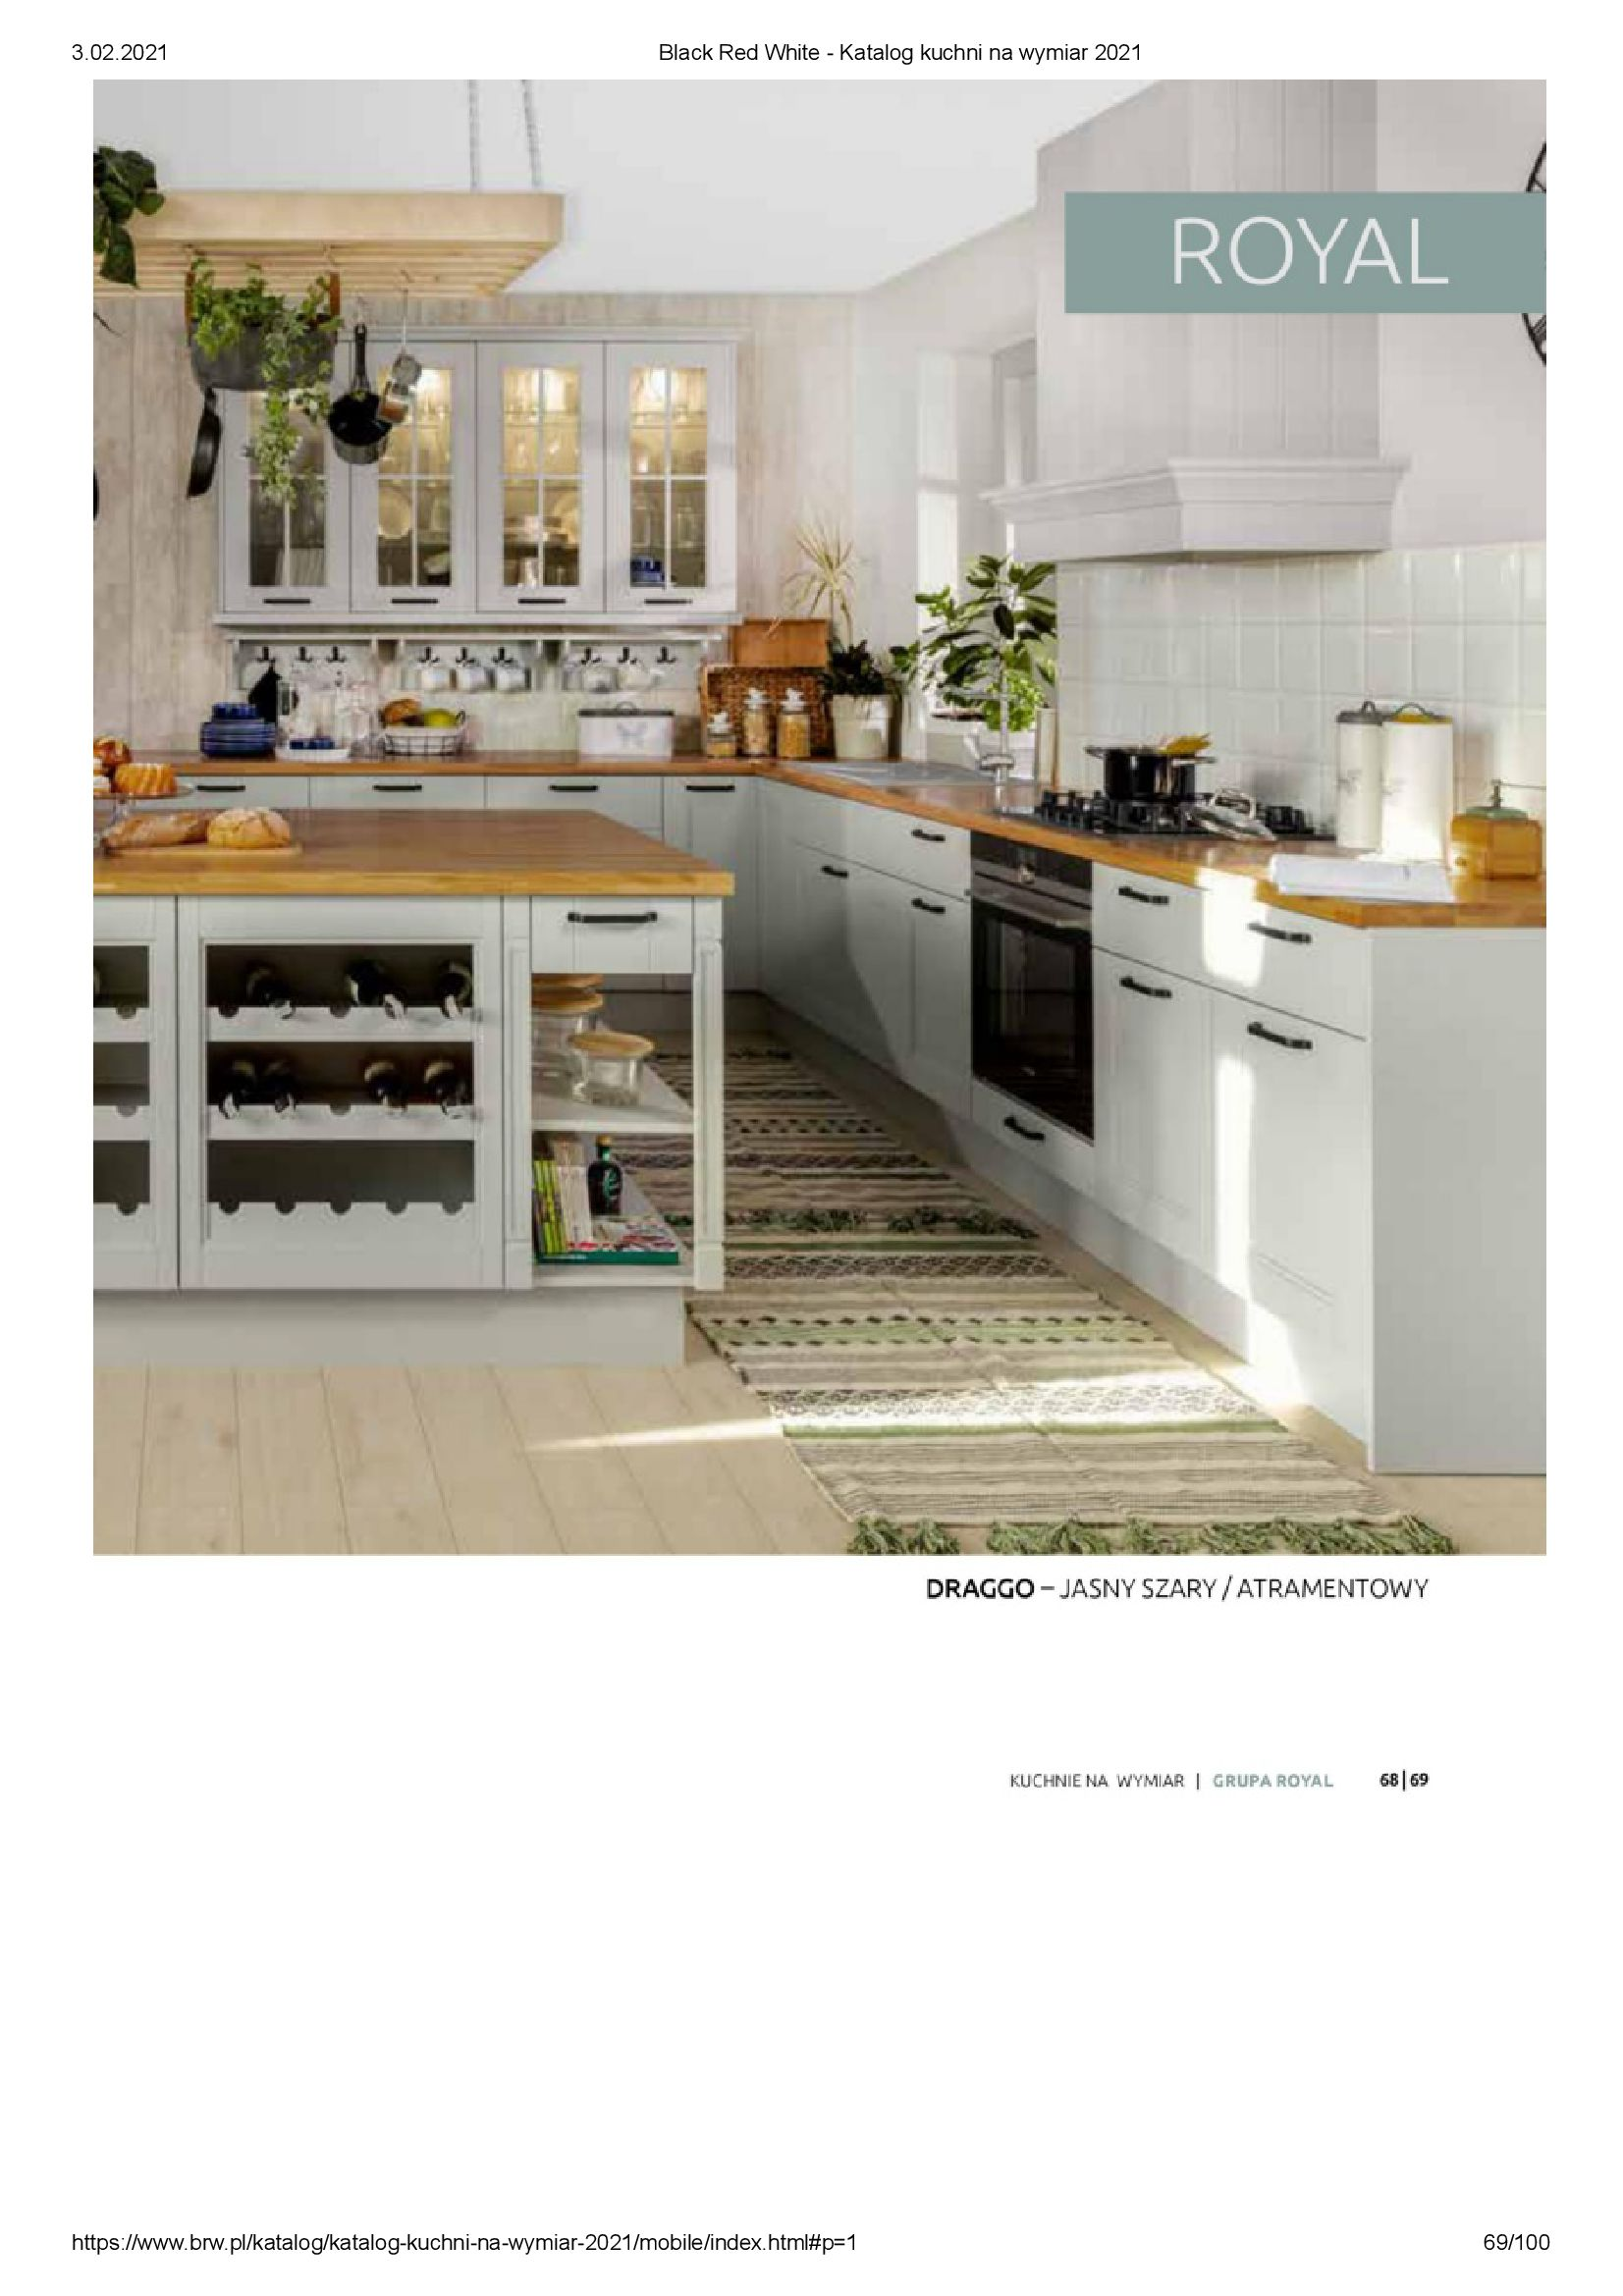 Gazetka Black Red White: Katalog - Kuchnie na wymiar Senso Kitchens 2021 2021-01-01 page-69